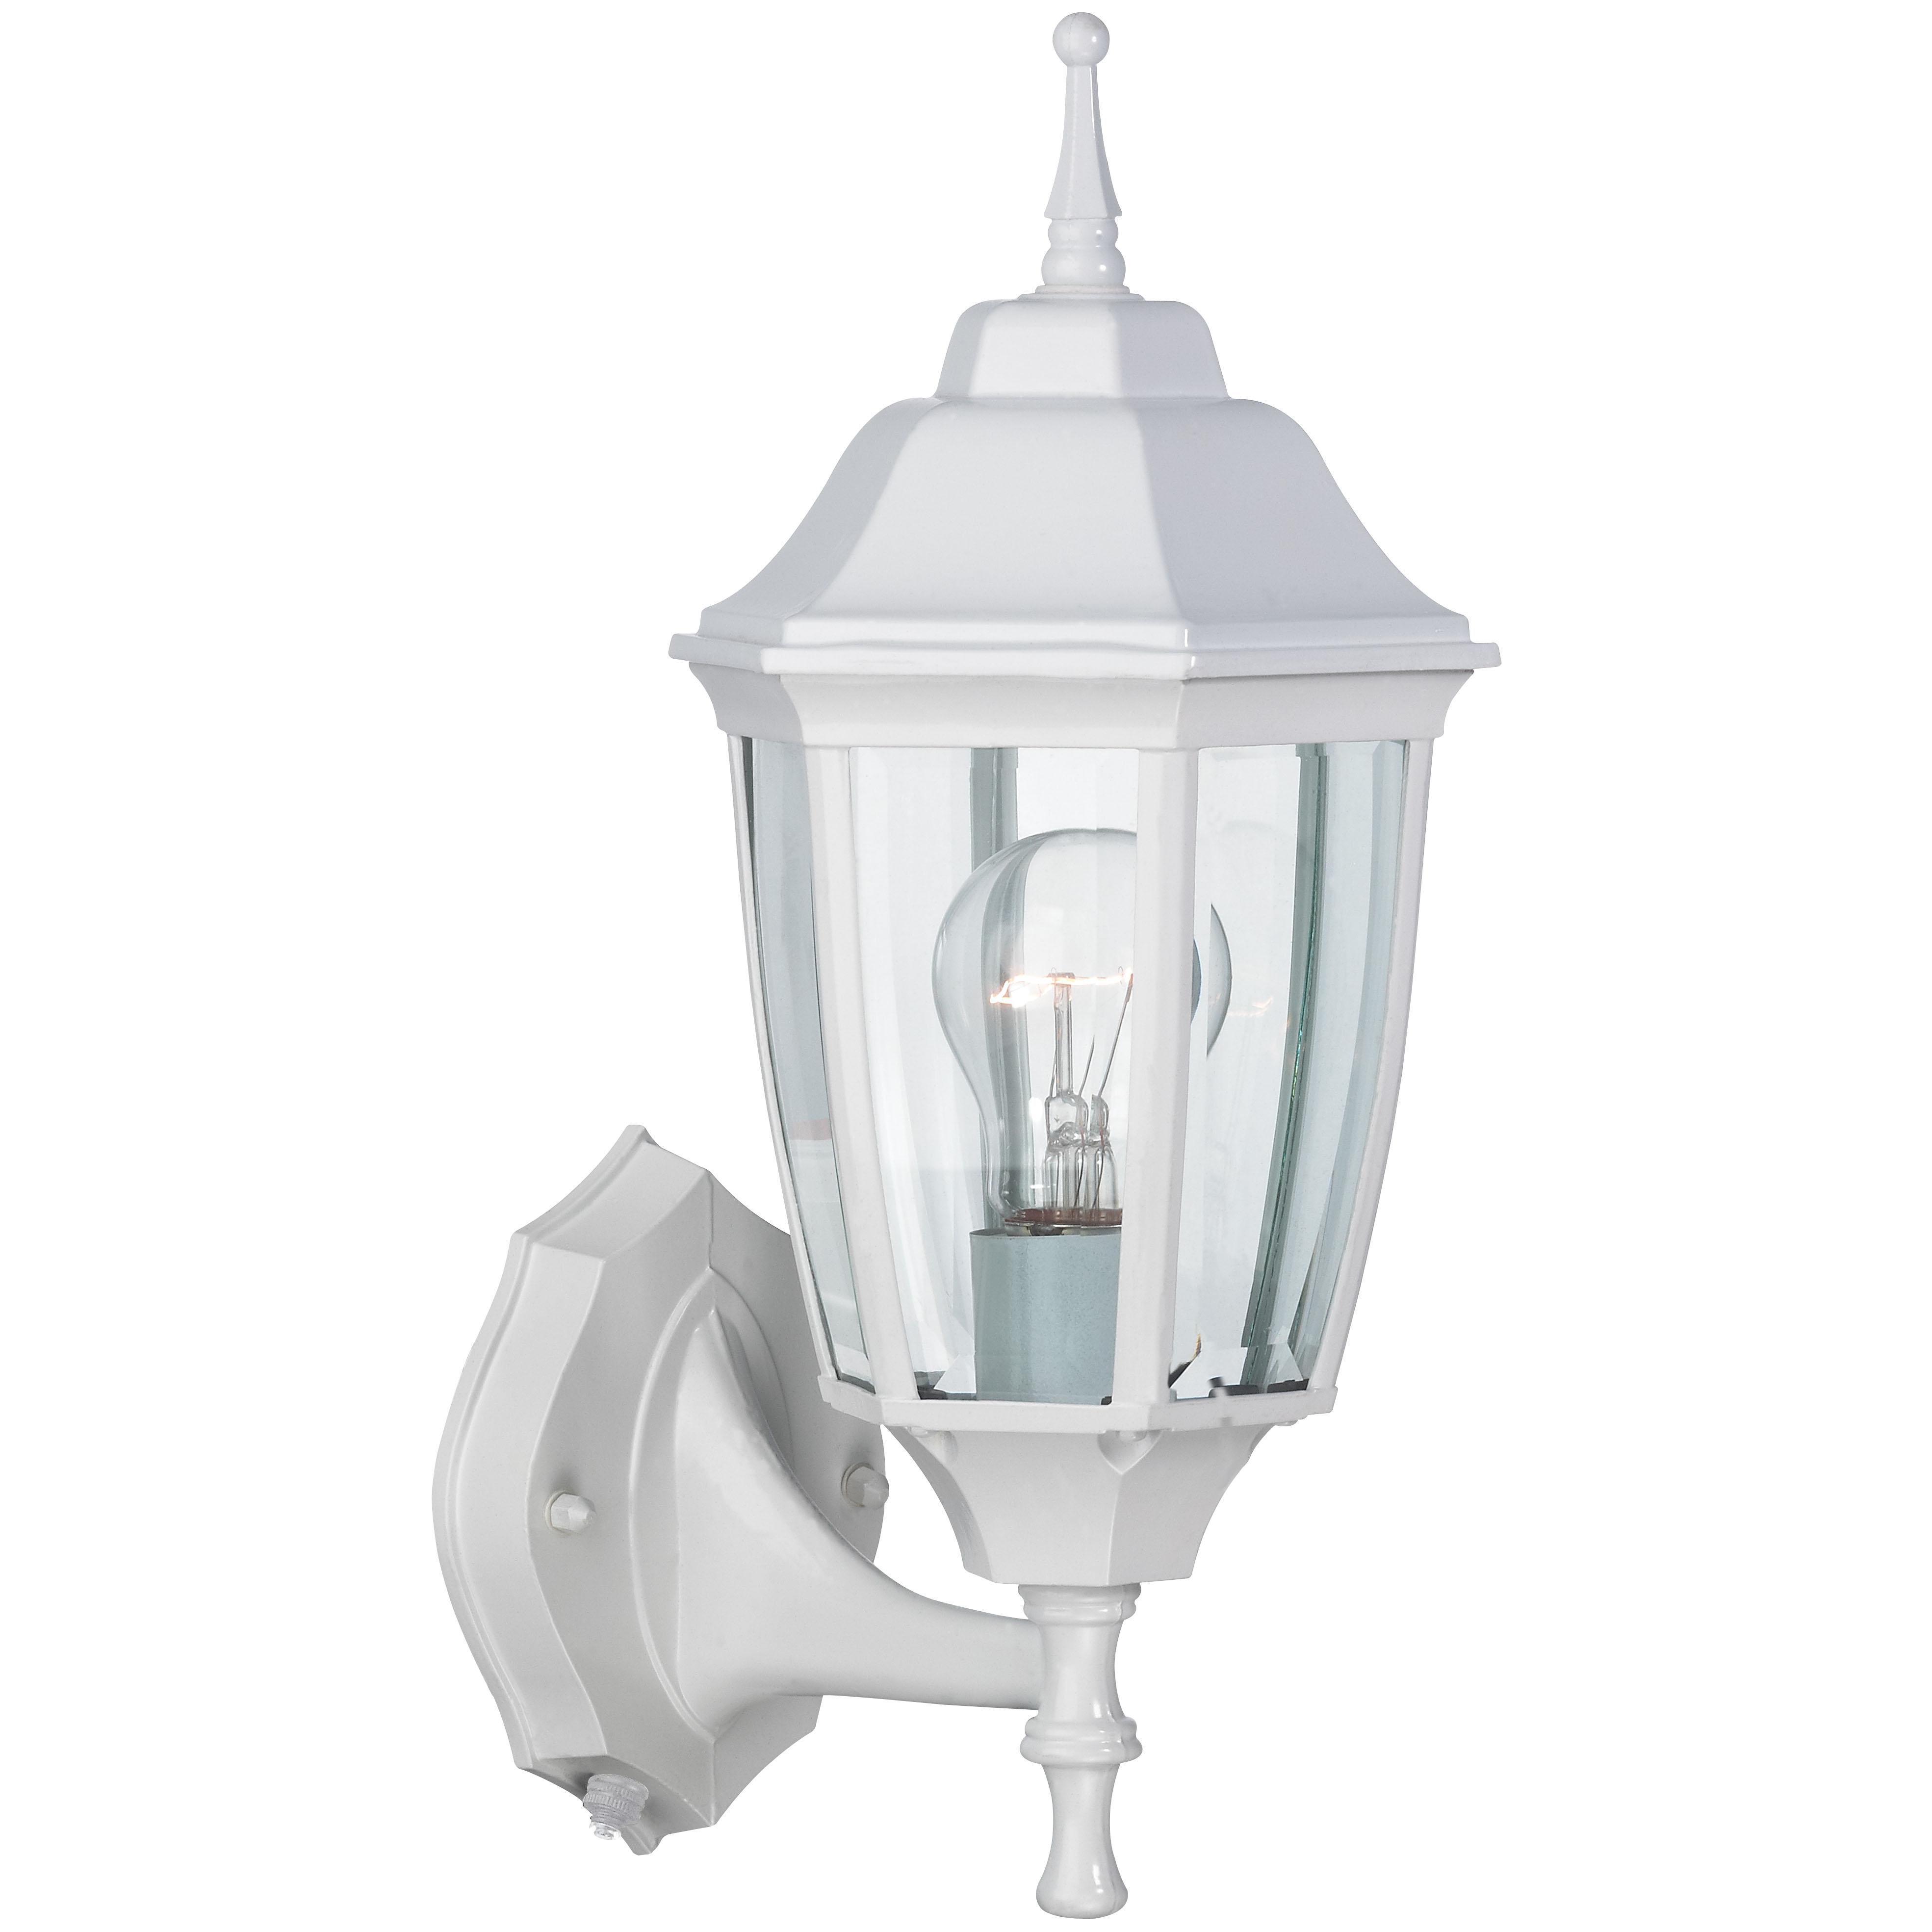 Picture of Boston Harbor DTDW Dusk/Dawn Lantern, CFL Lamp, Aluminum Fixture, White Fixture